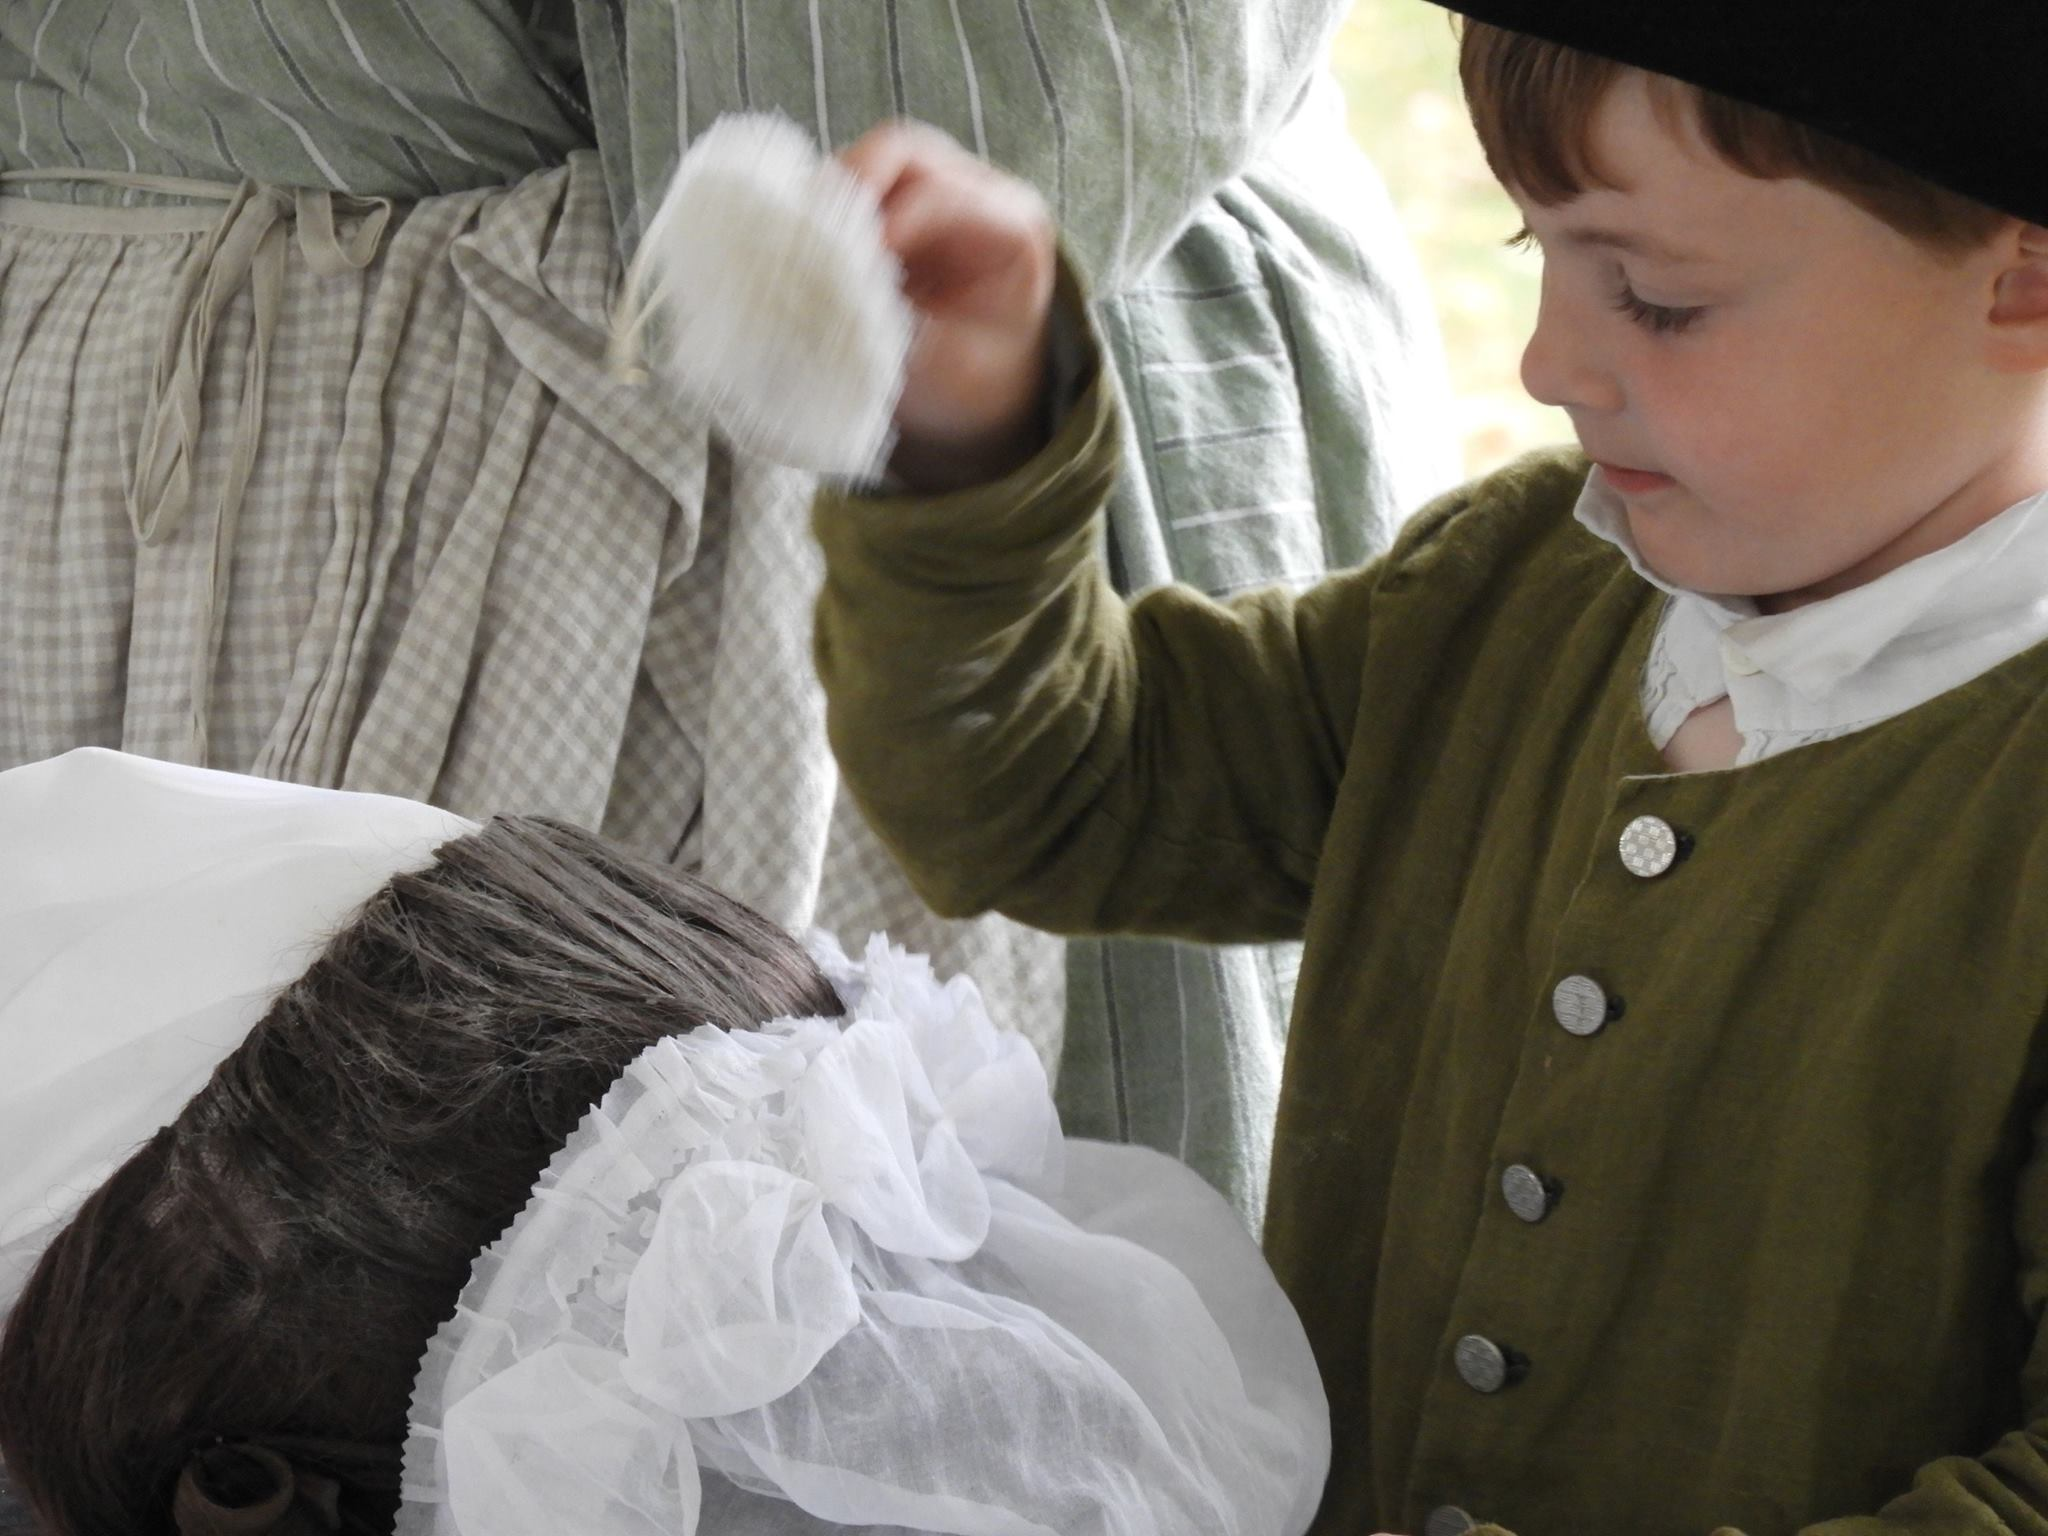 Child with Hair Powder